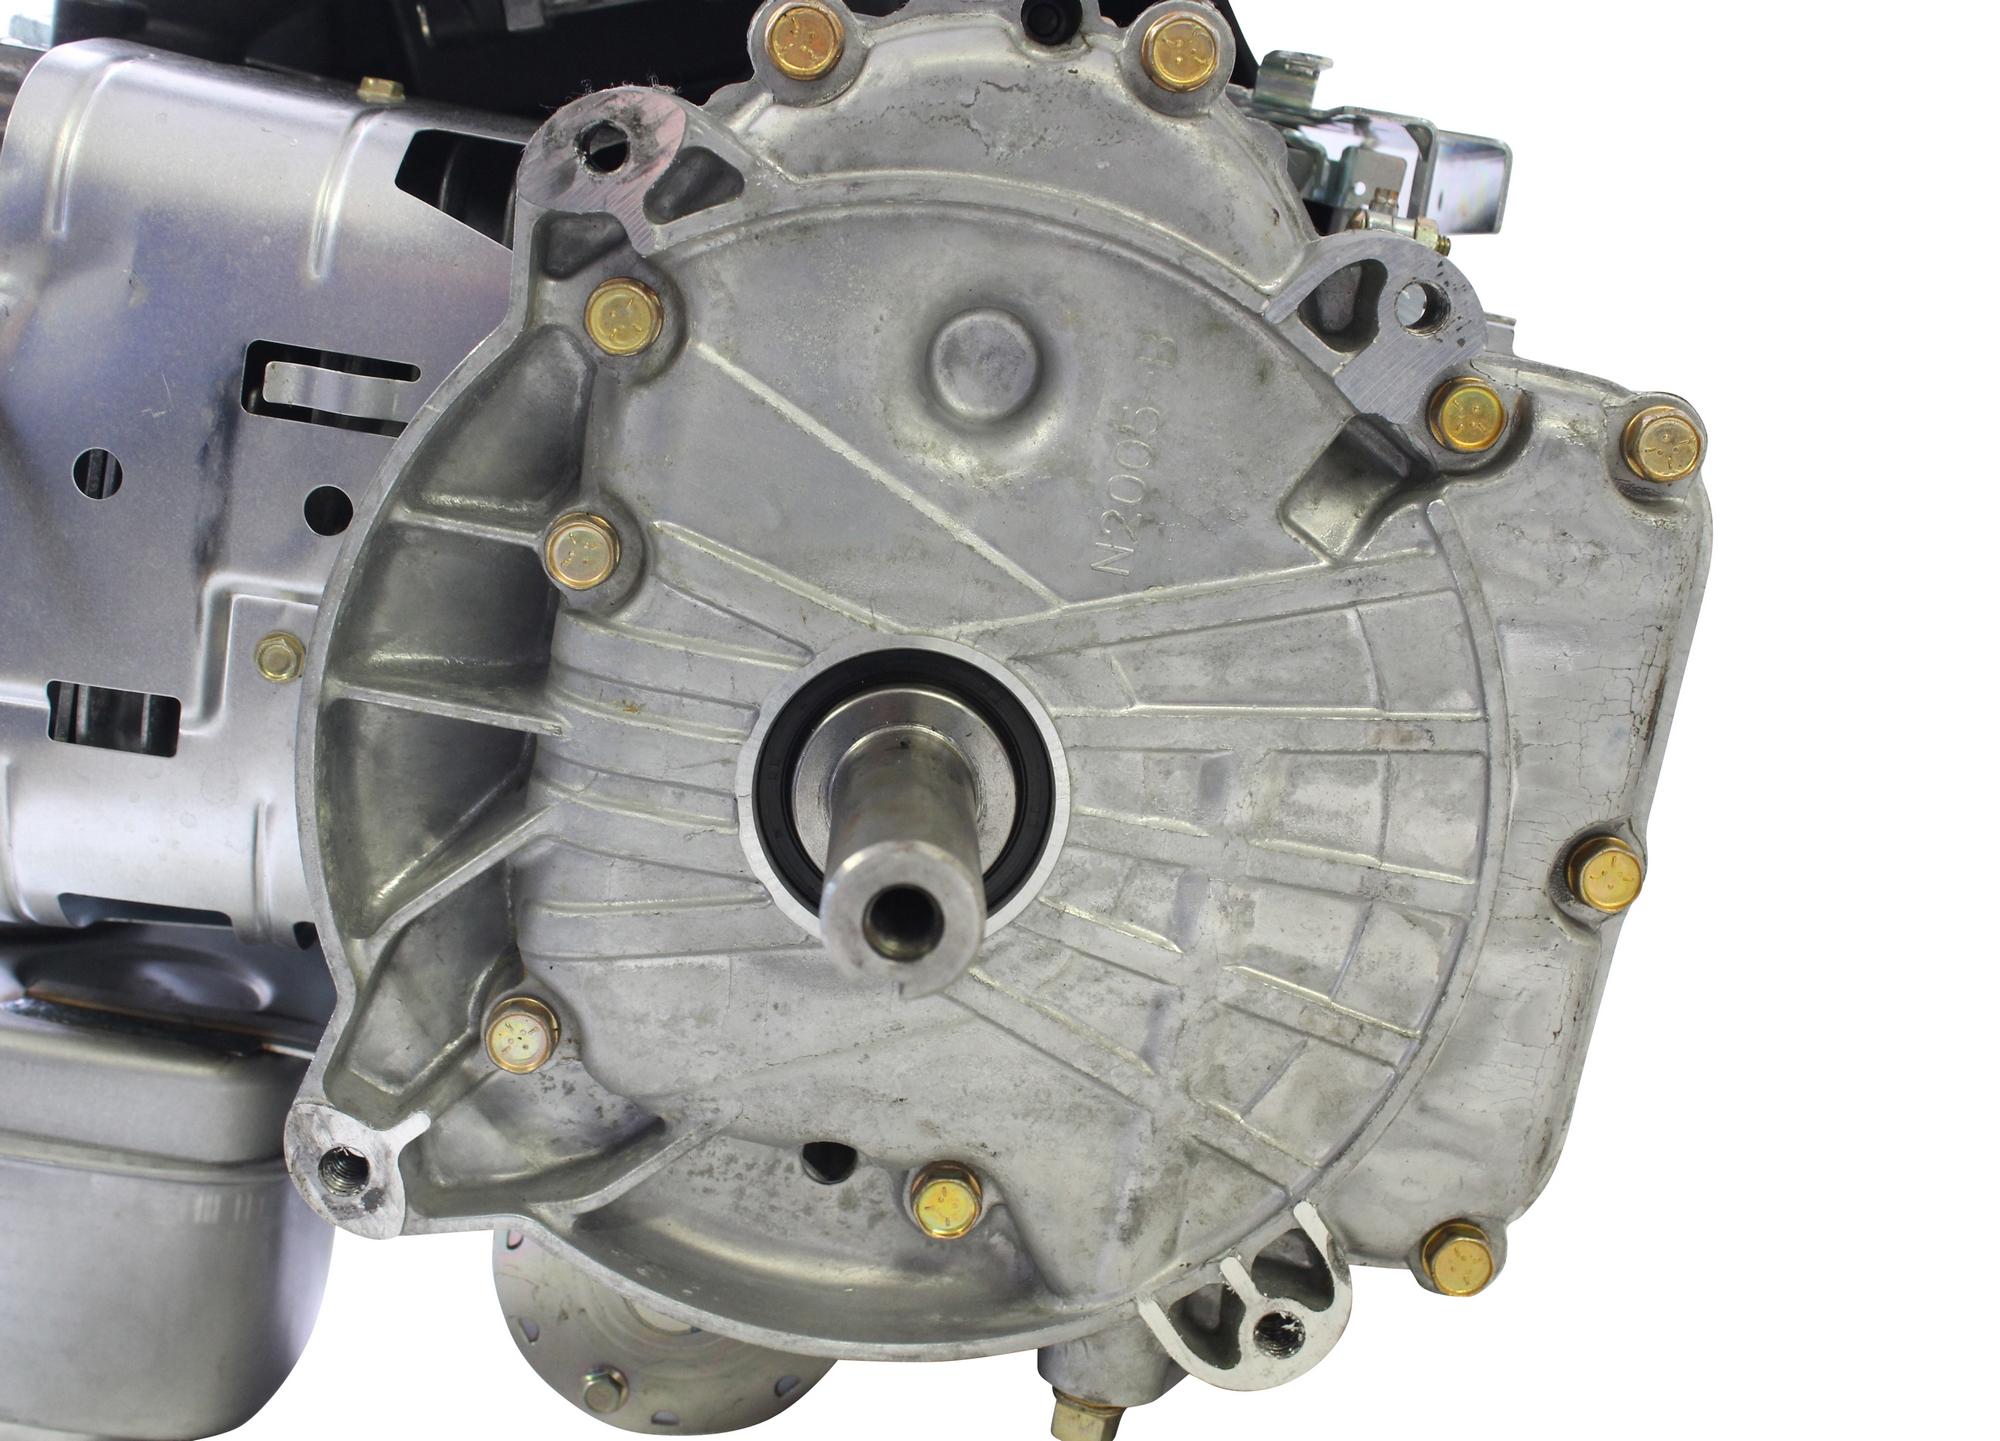 11 Ps Rasentraktormotor Briggs Stratton Motor Intek 1 Zyl Ohv Mit Have A 145 Horsepower And Engine That Was Elektrostart Auspuff 254 80